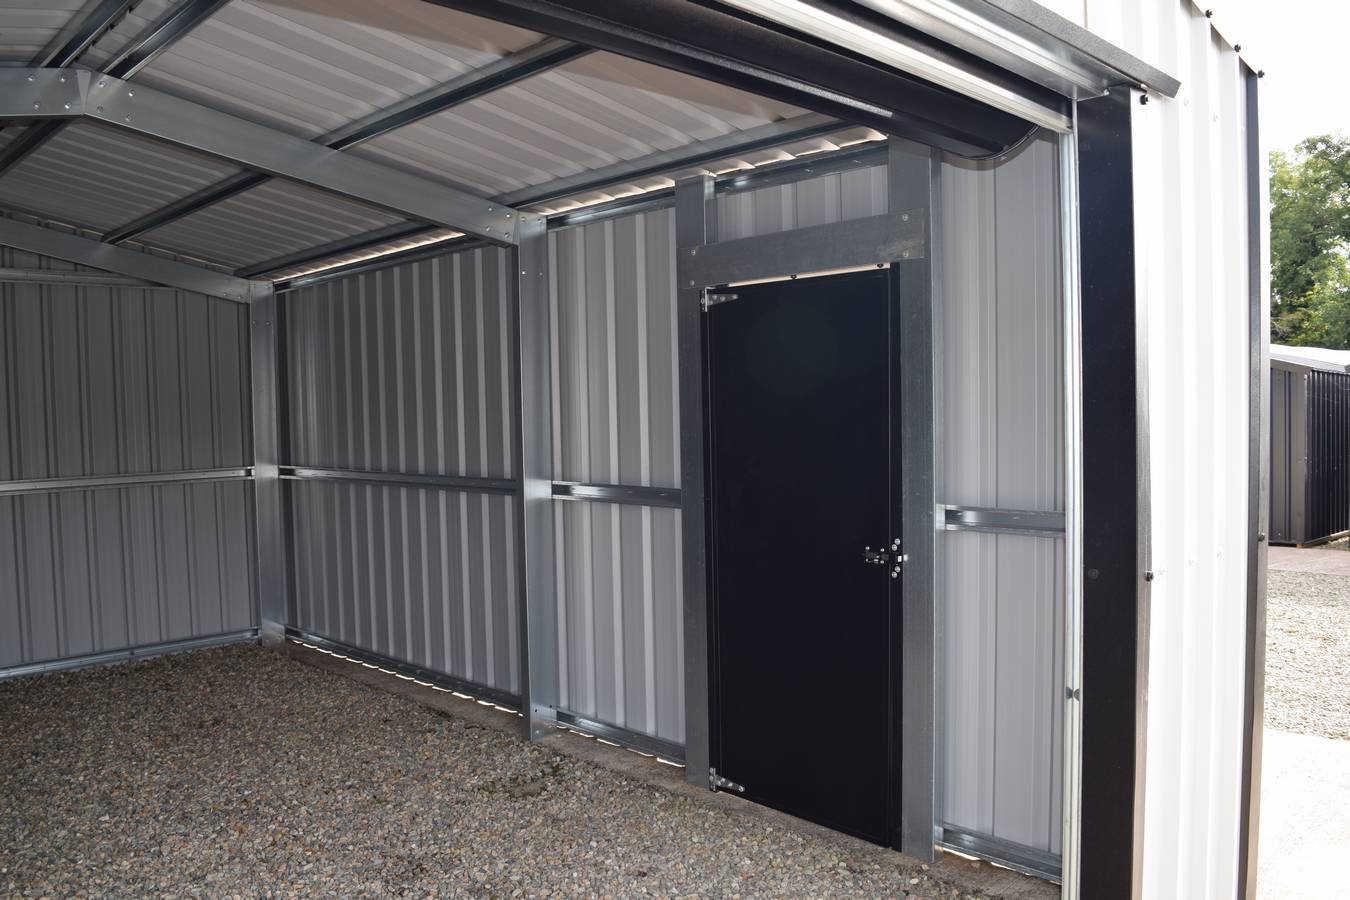 metal-garage-11.jpg